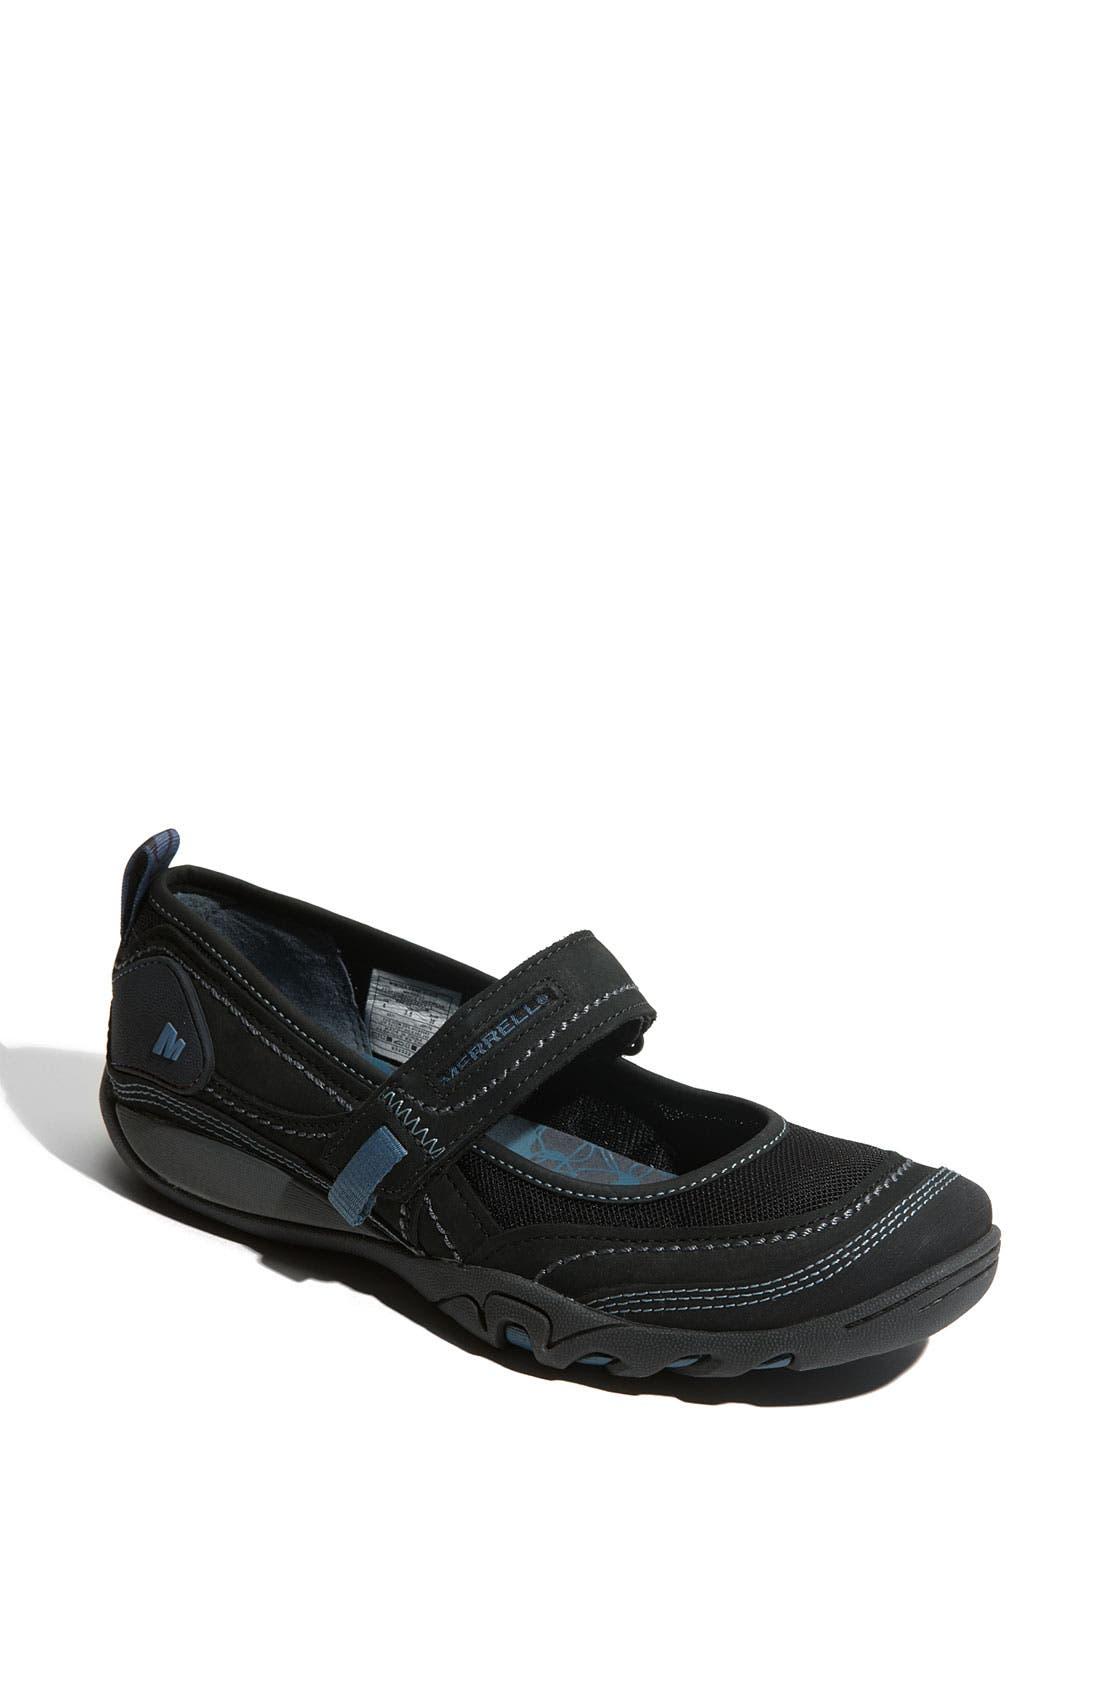 Alternate Image 1 Selected - Merrell 'Mimosa' Sneaker